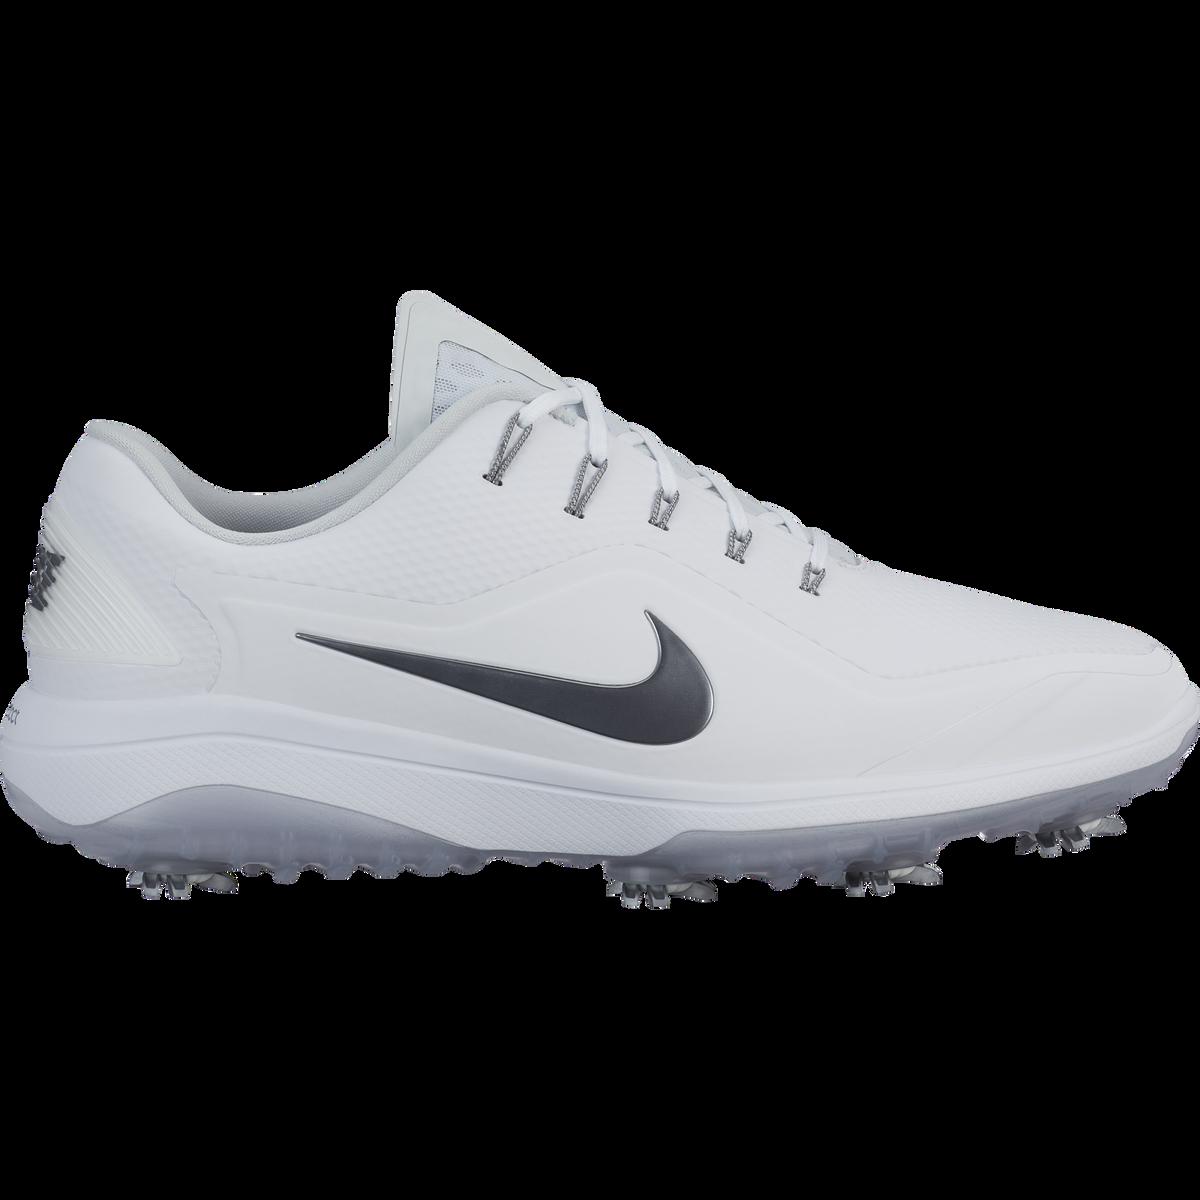 923cda182790d Images. Nike React Vapor 2 Men  39 s Golf Shoe - White